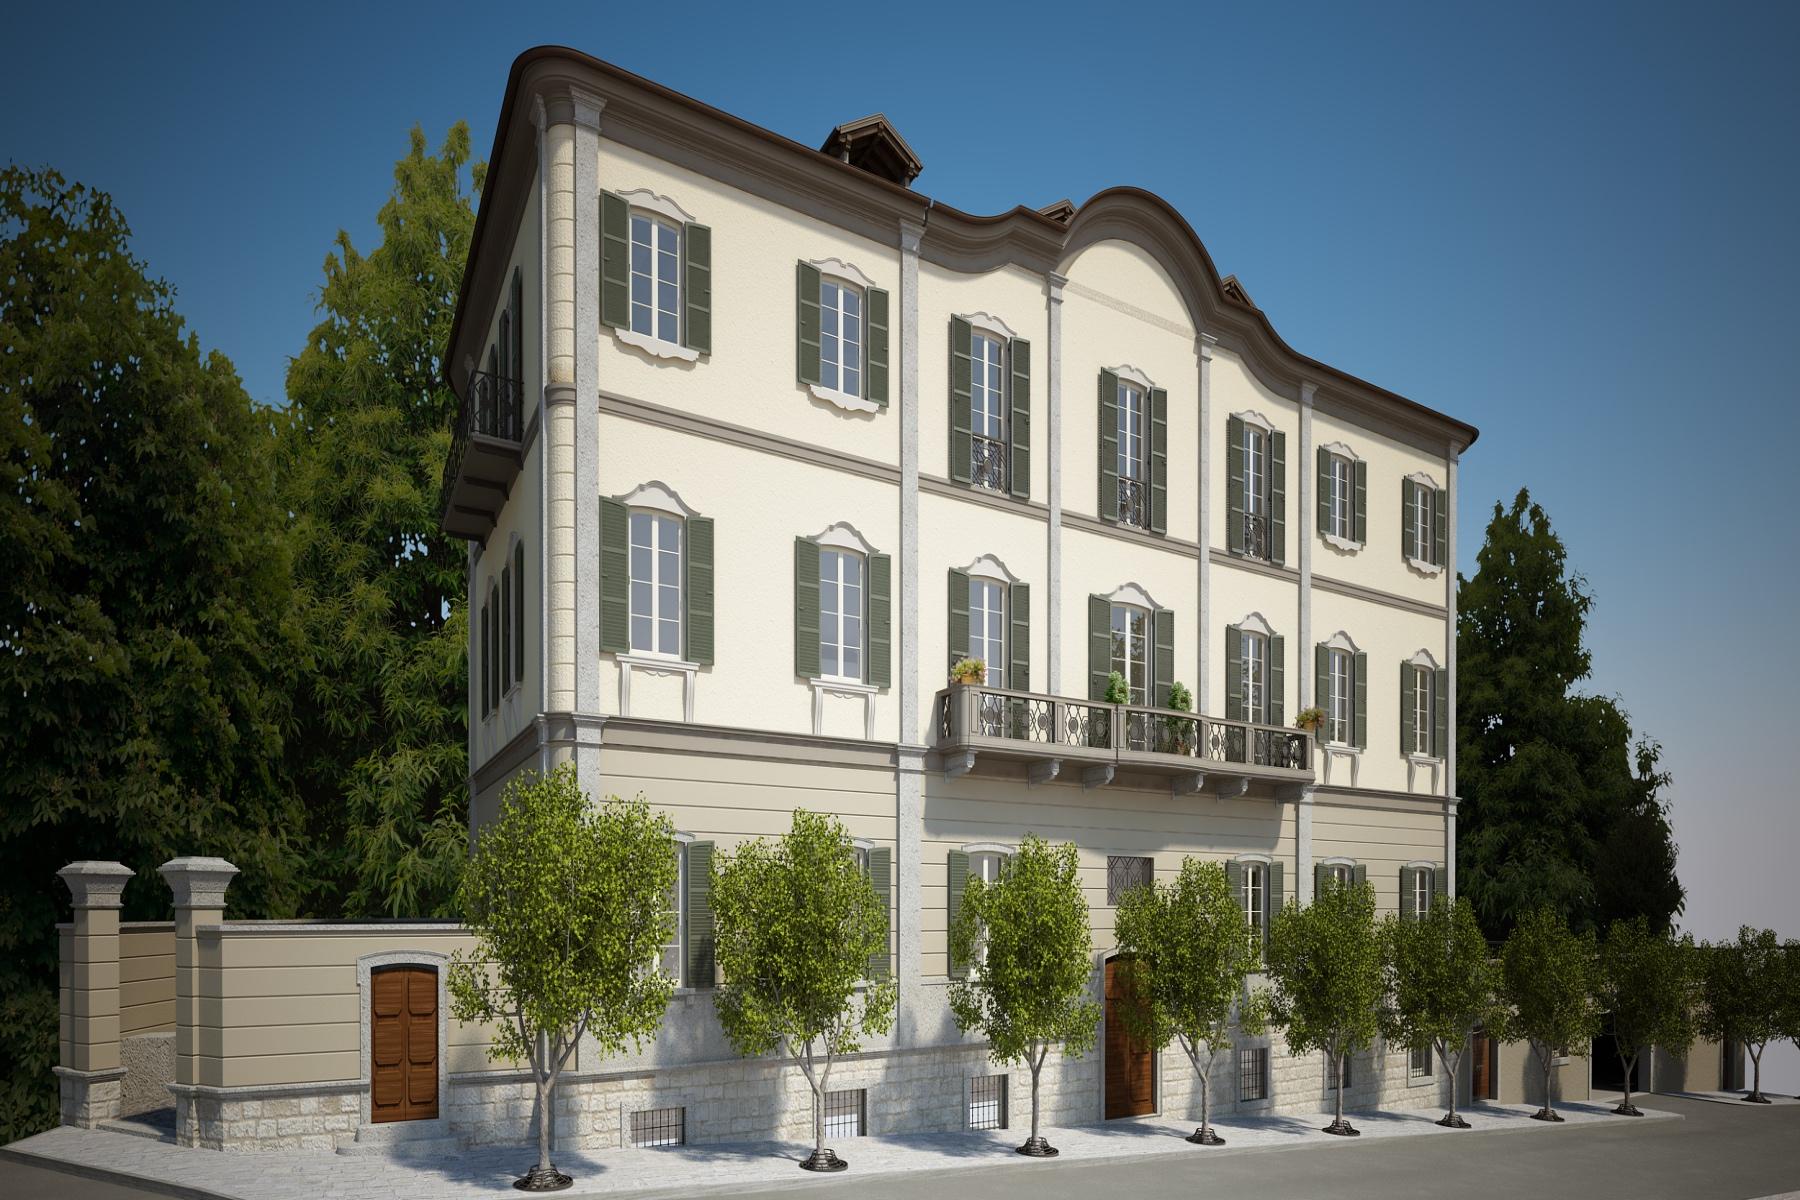 Property for Sale at Elegant palazzo overlooking the lake Verbania, Verbano Cusio Ossola Italy